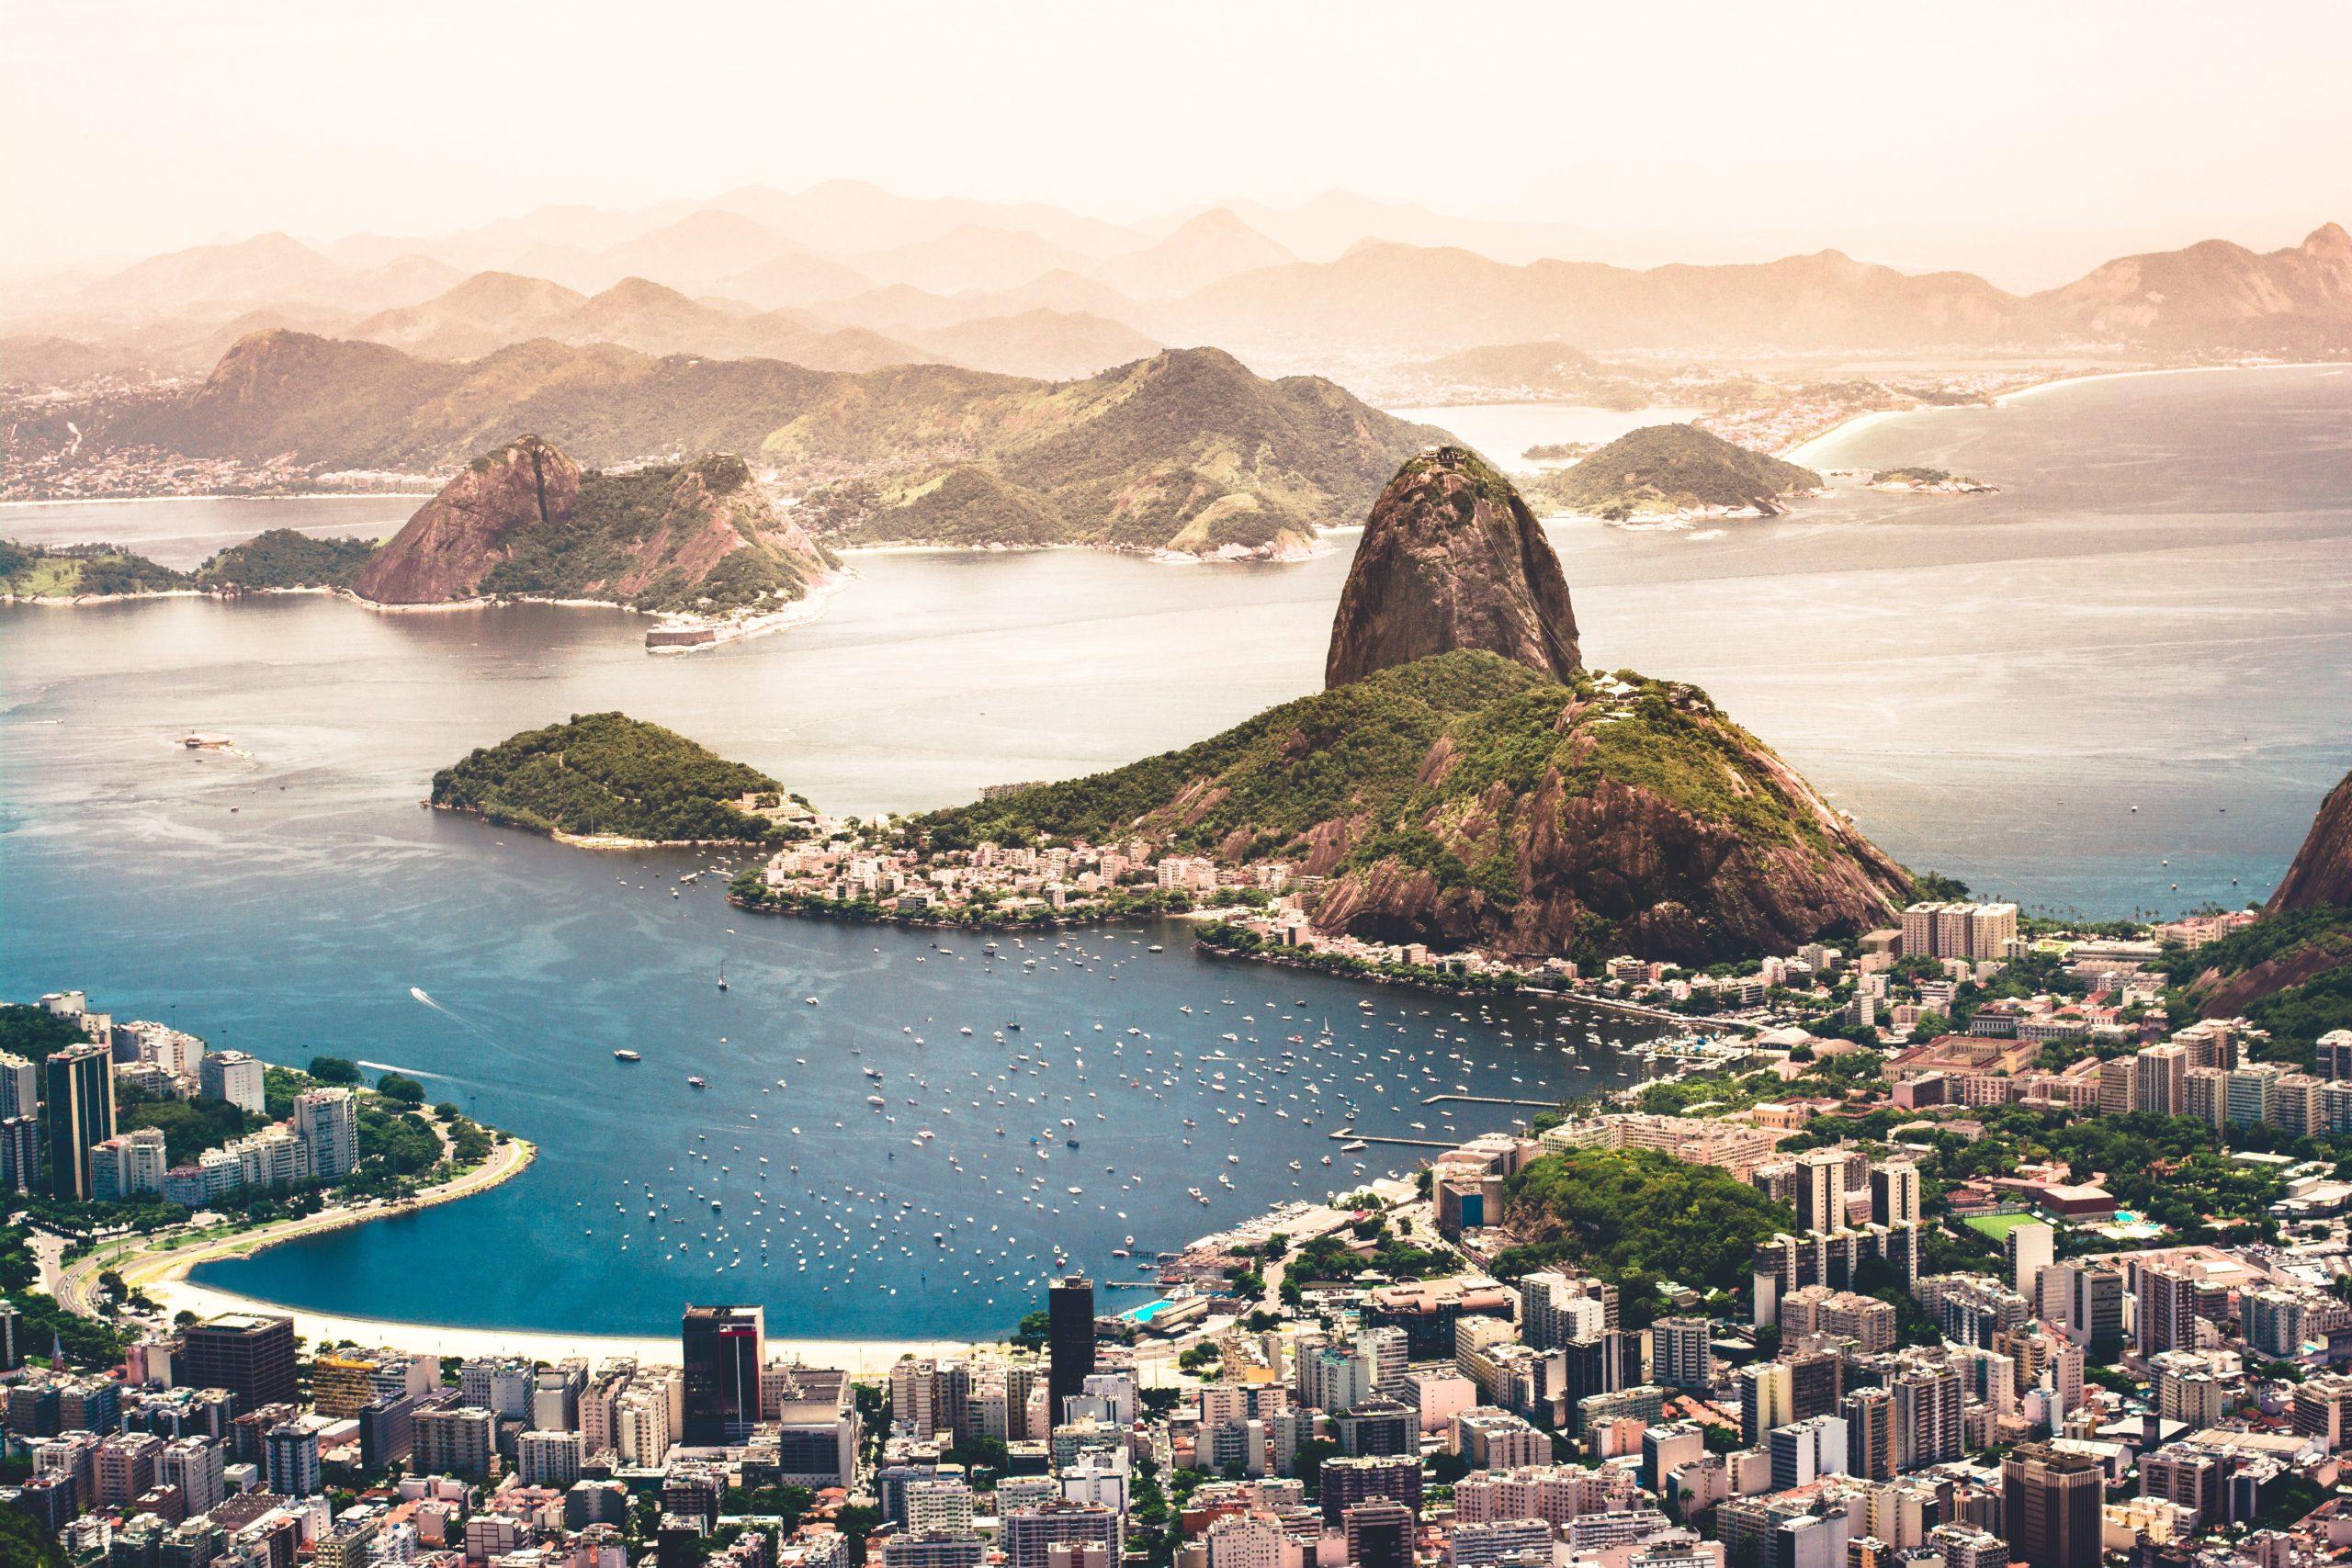 Thortax - brasilian taxes